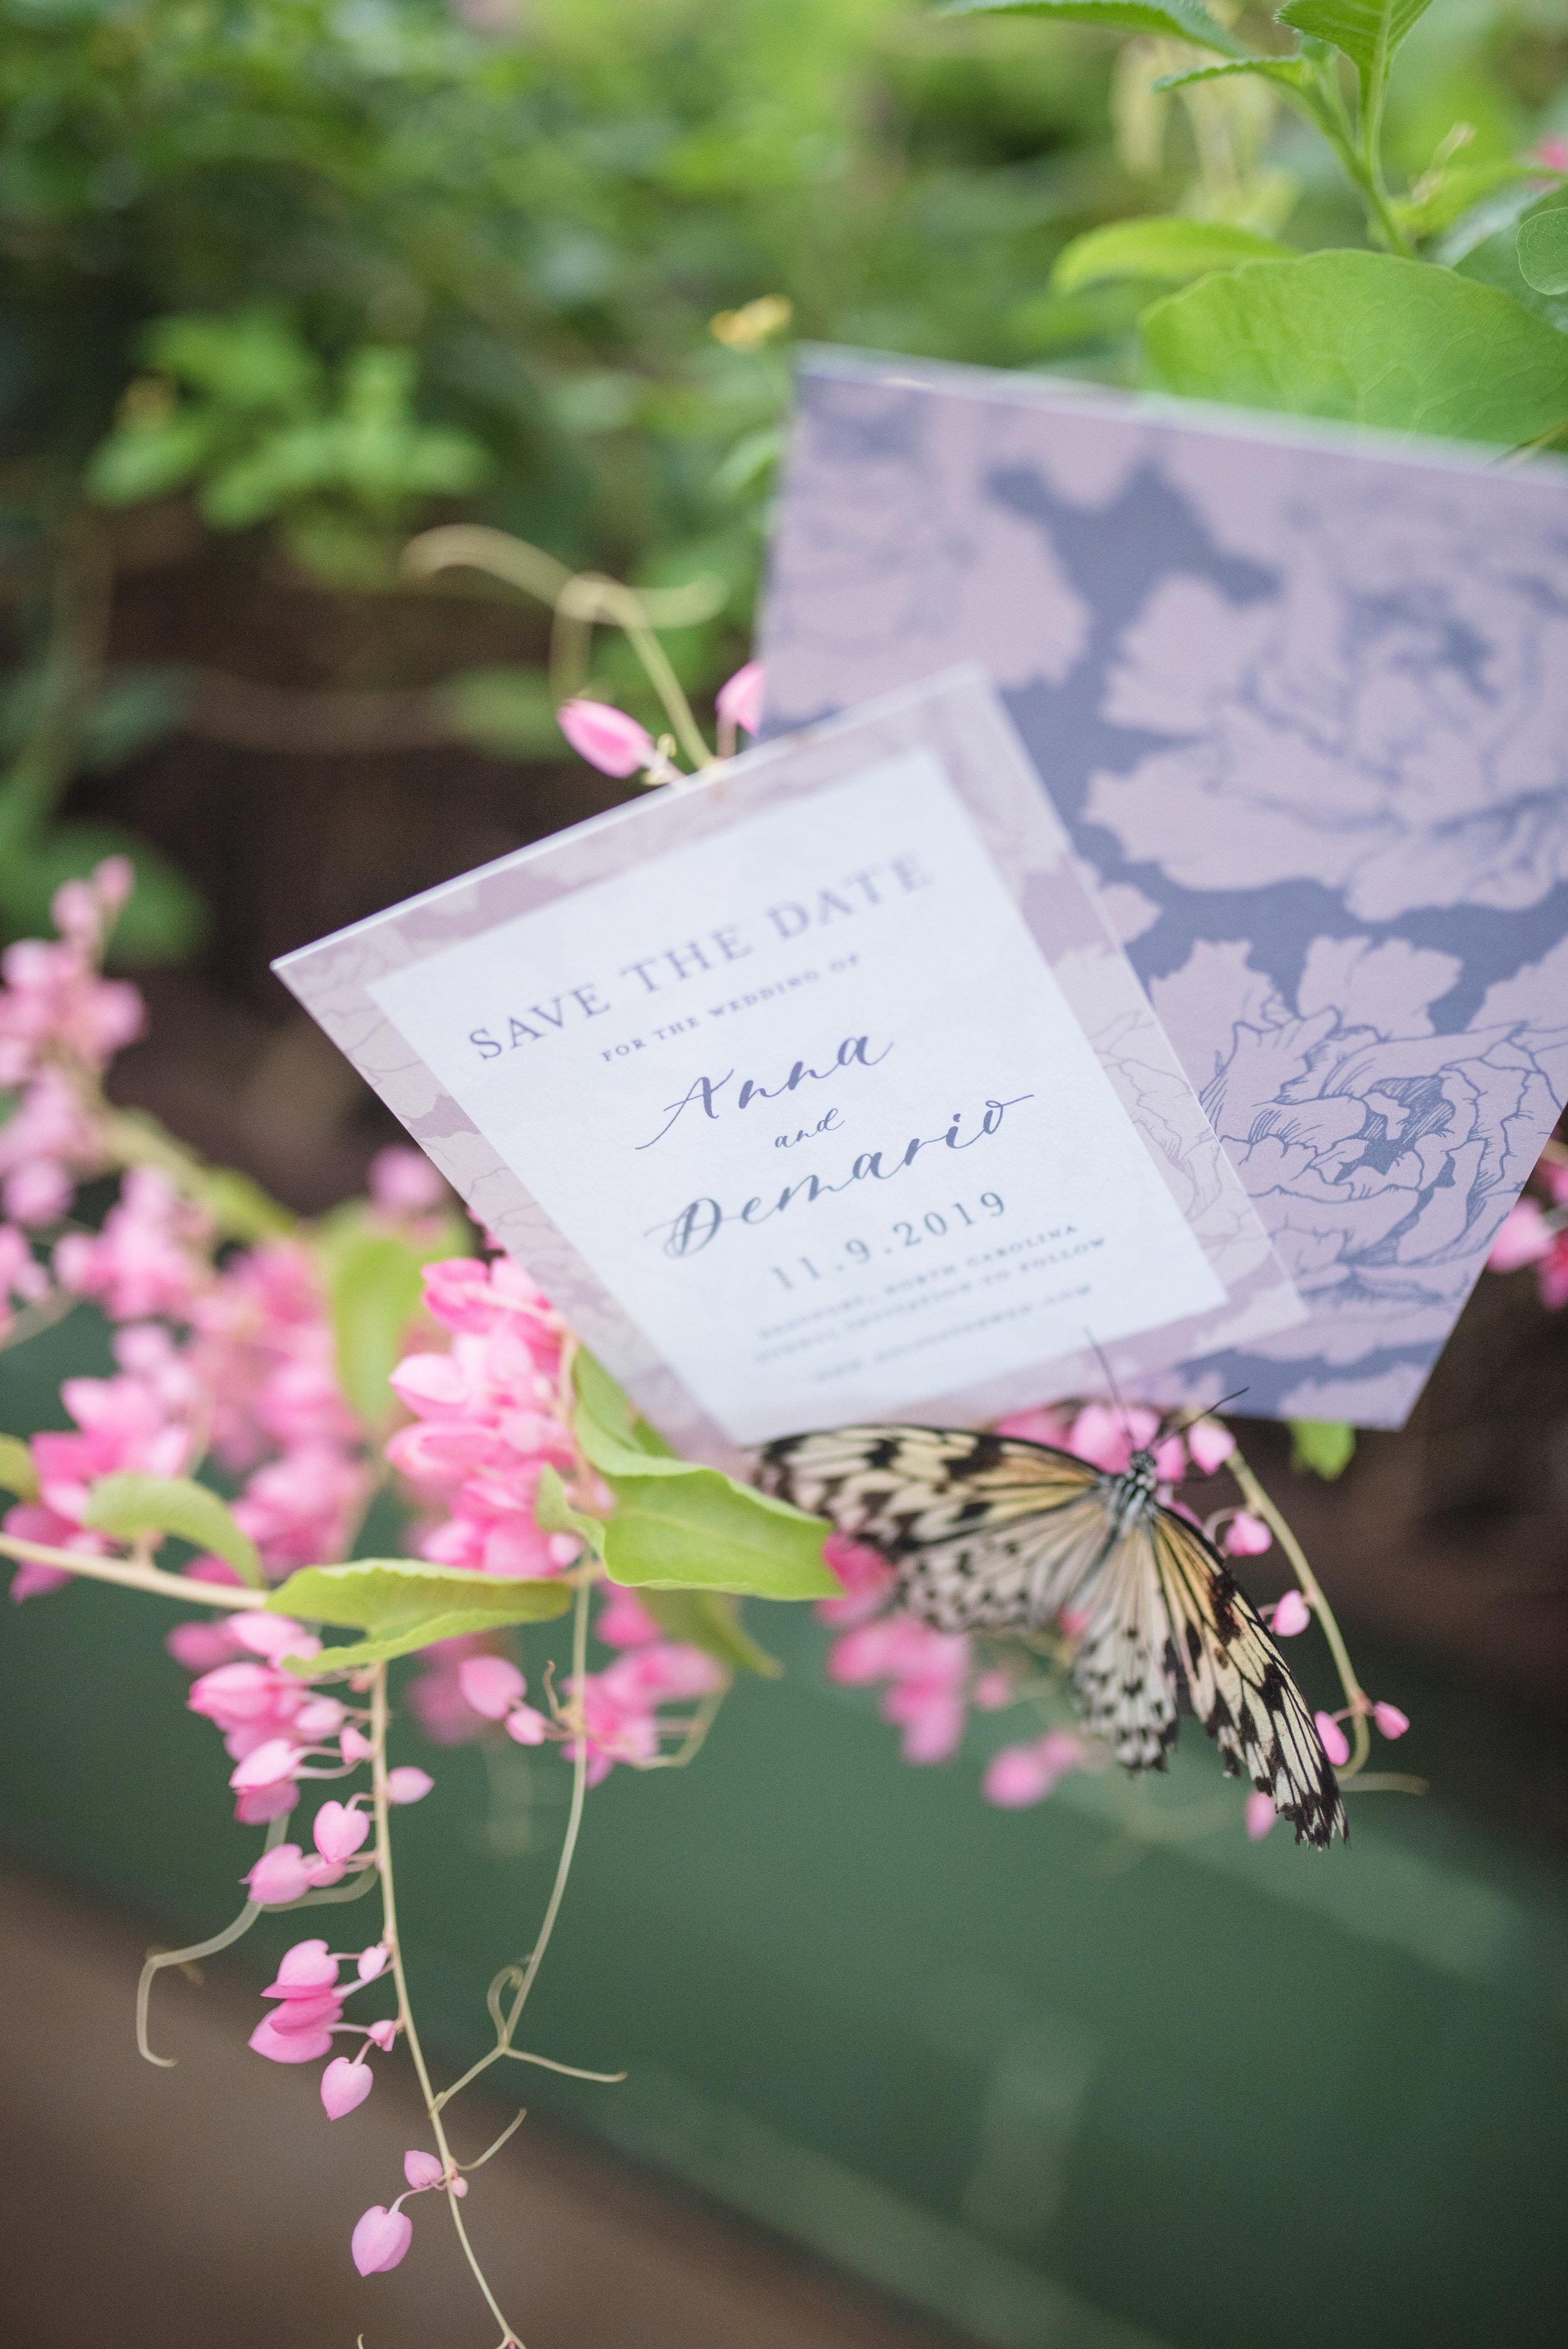 Anna Hand Drawn Wedding Invitation Pink Peonies Feathered Heart PrintsButterfly Garden (147 of 187).jpg